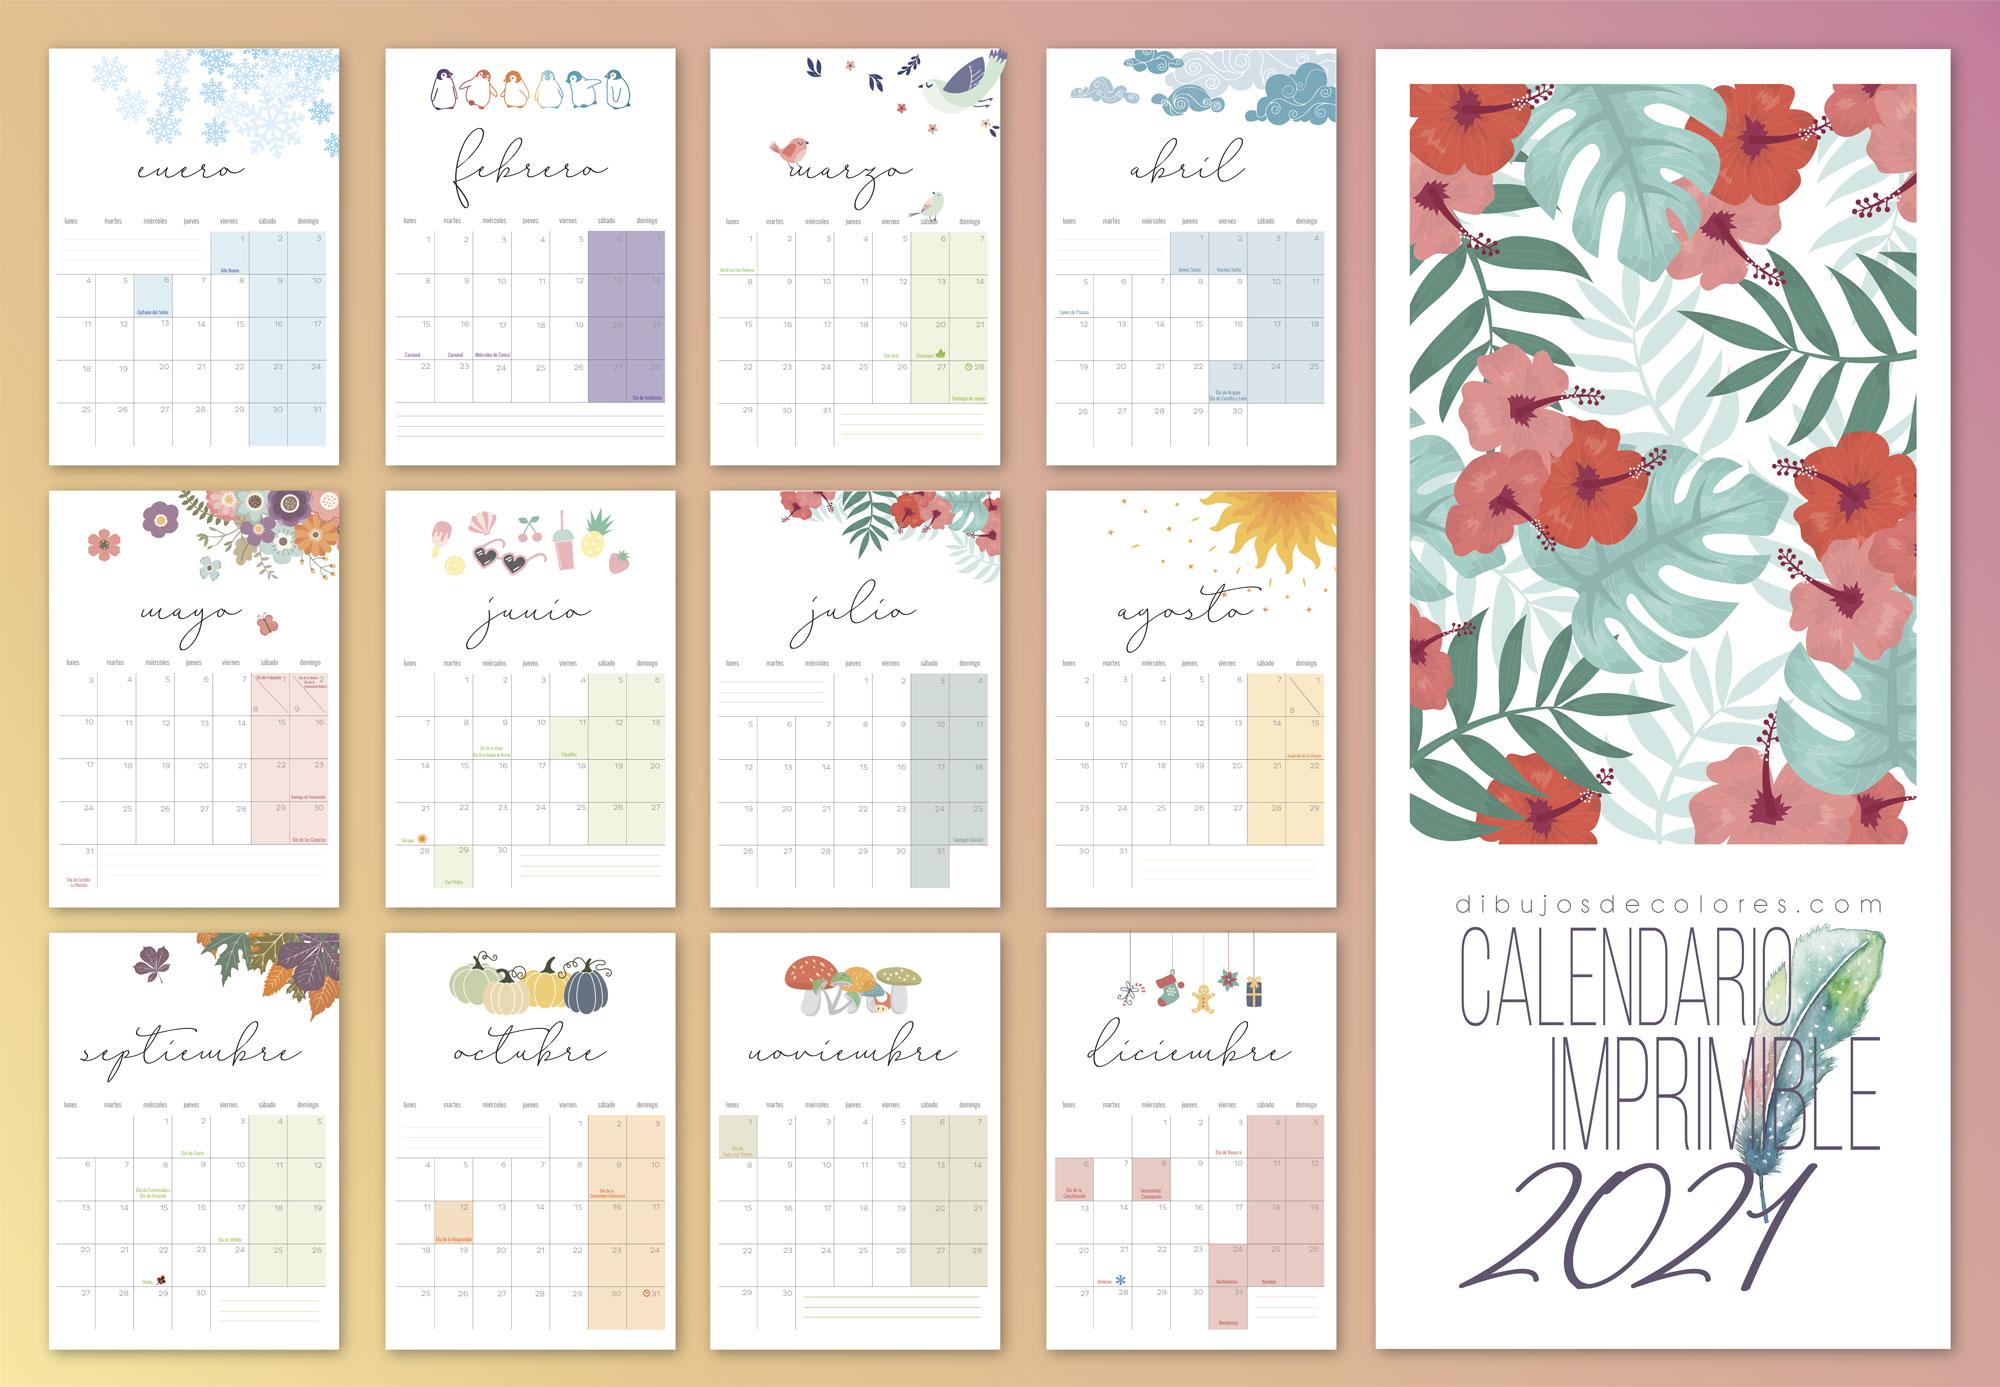 free calendar 2021